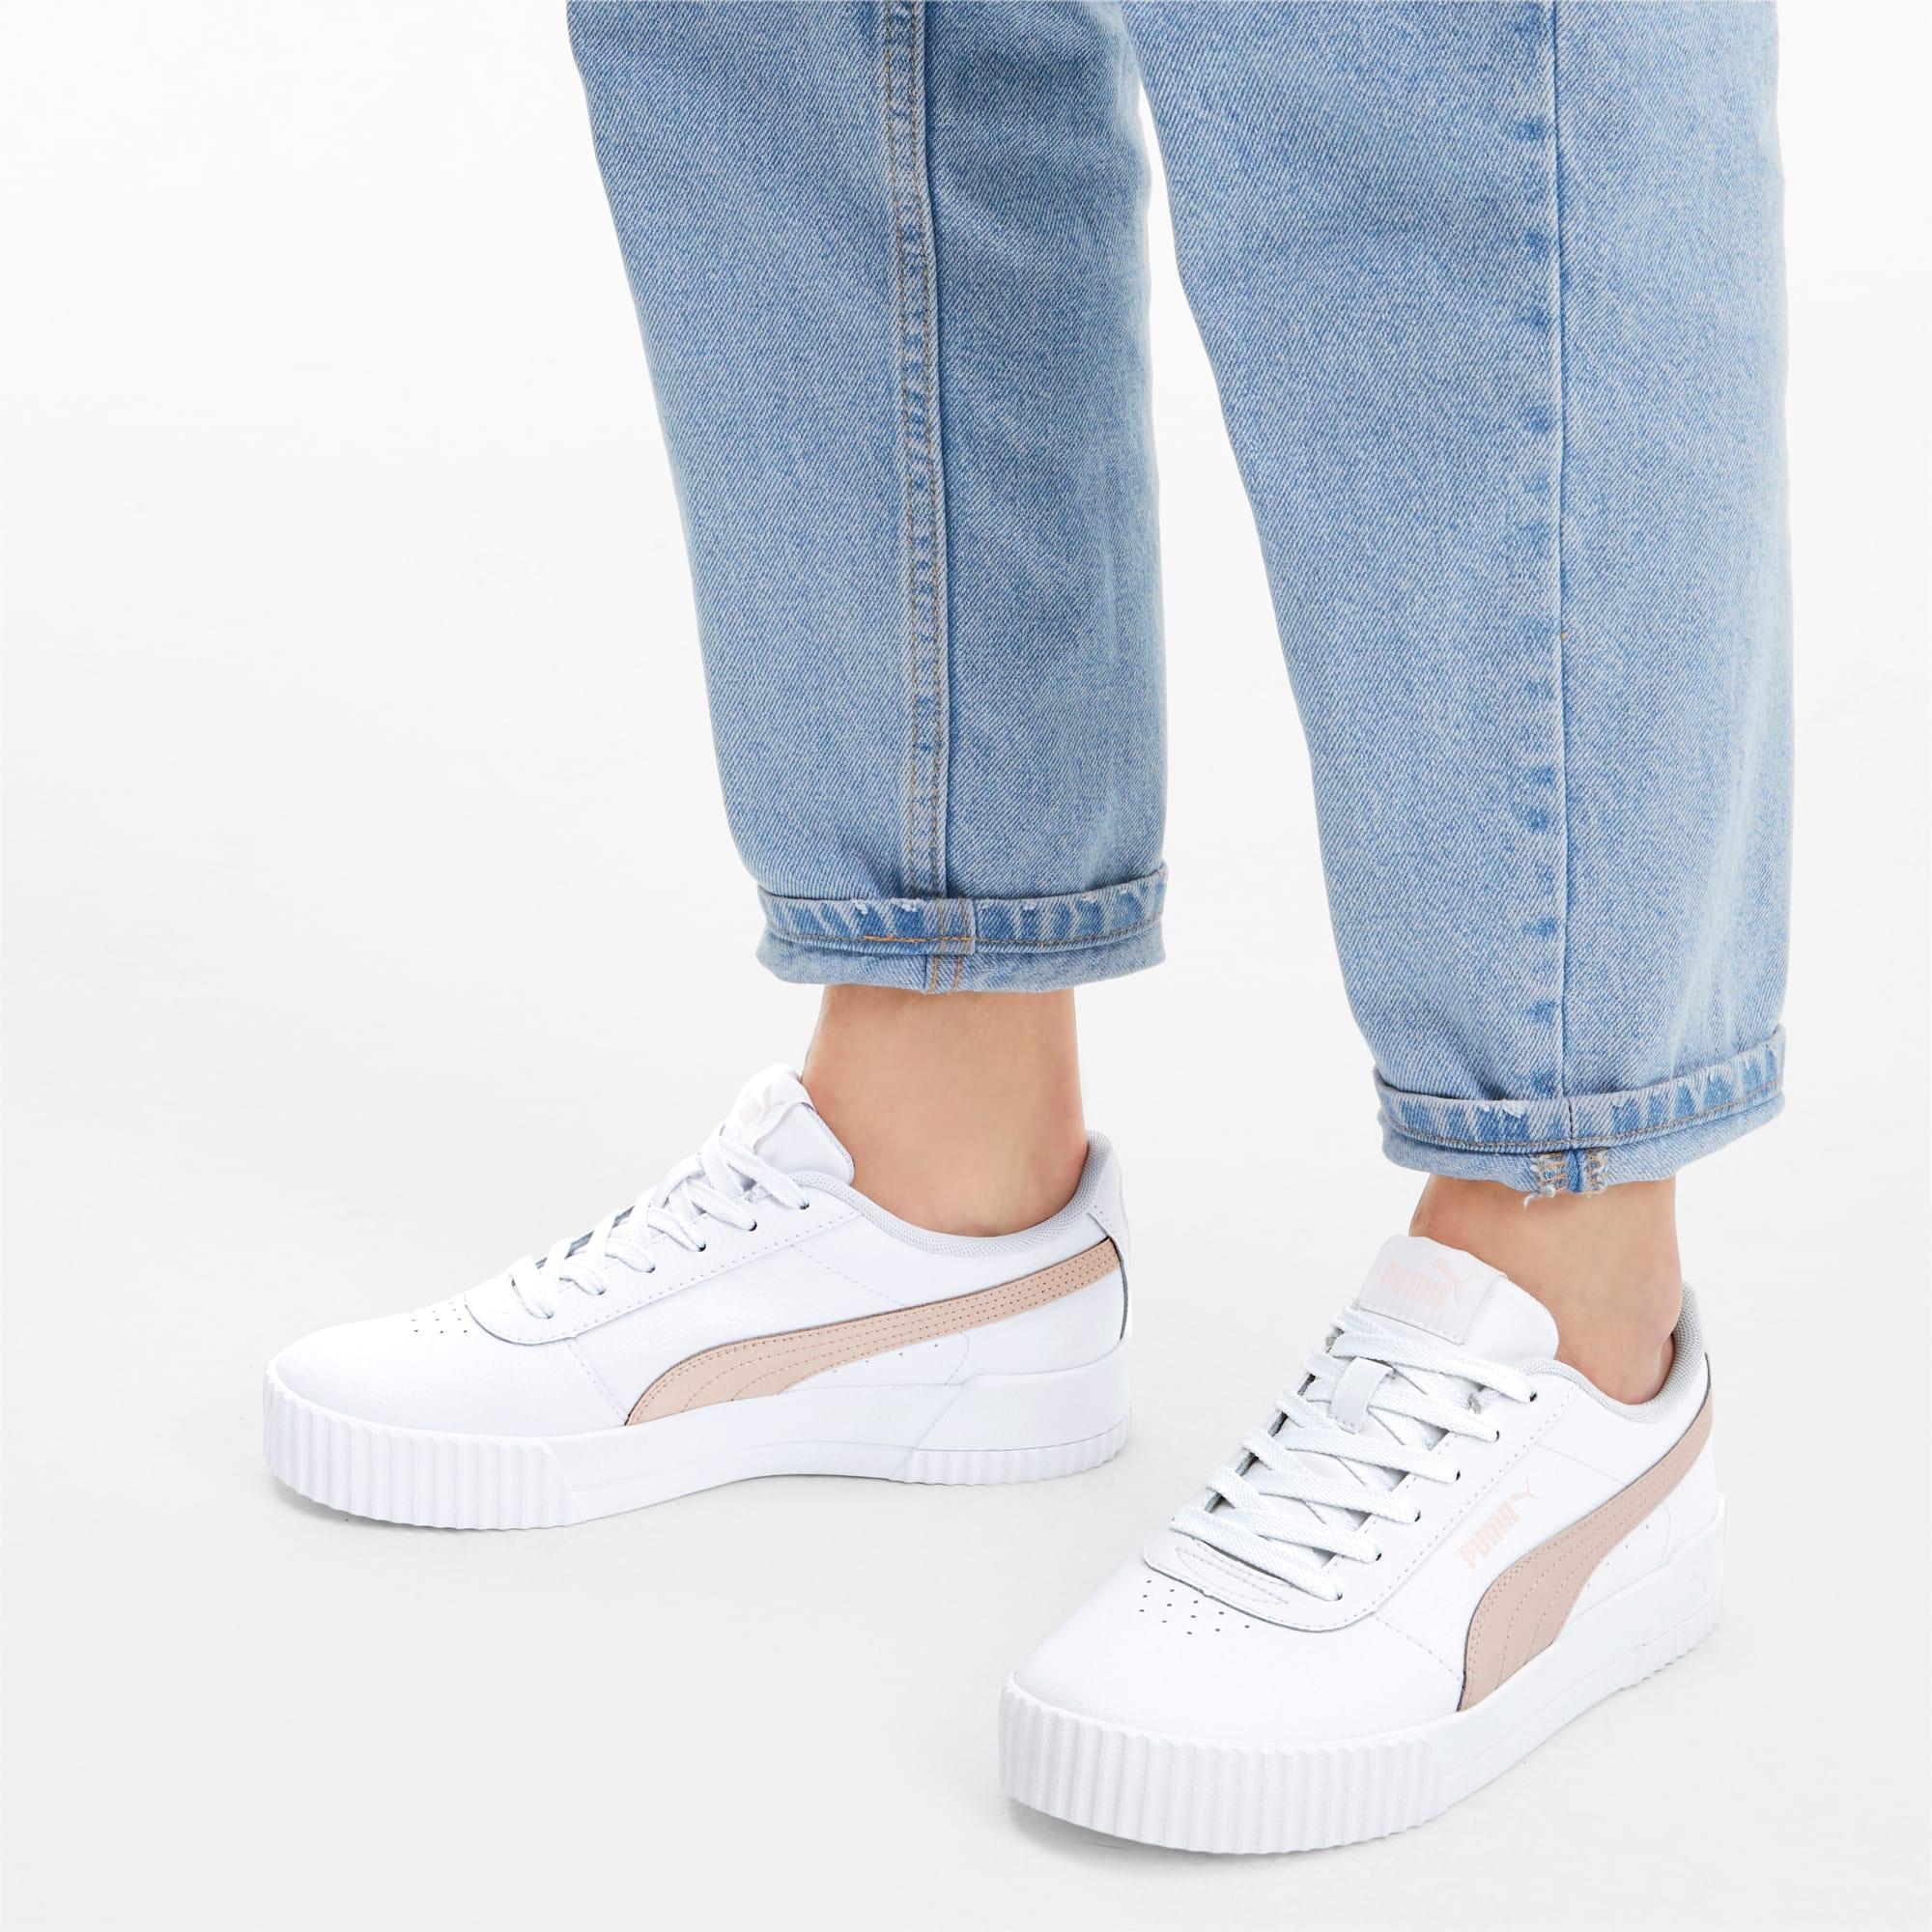 scarpe puma donna in pelle